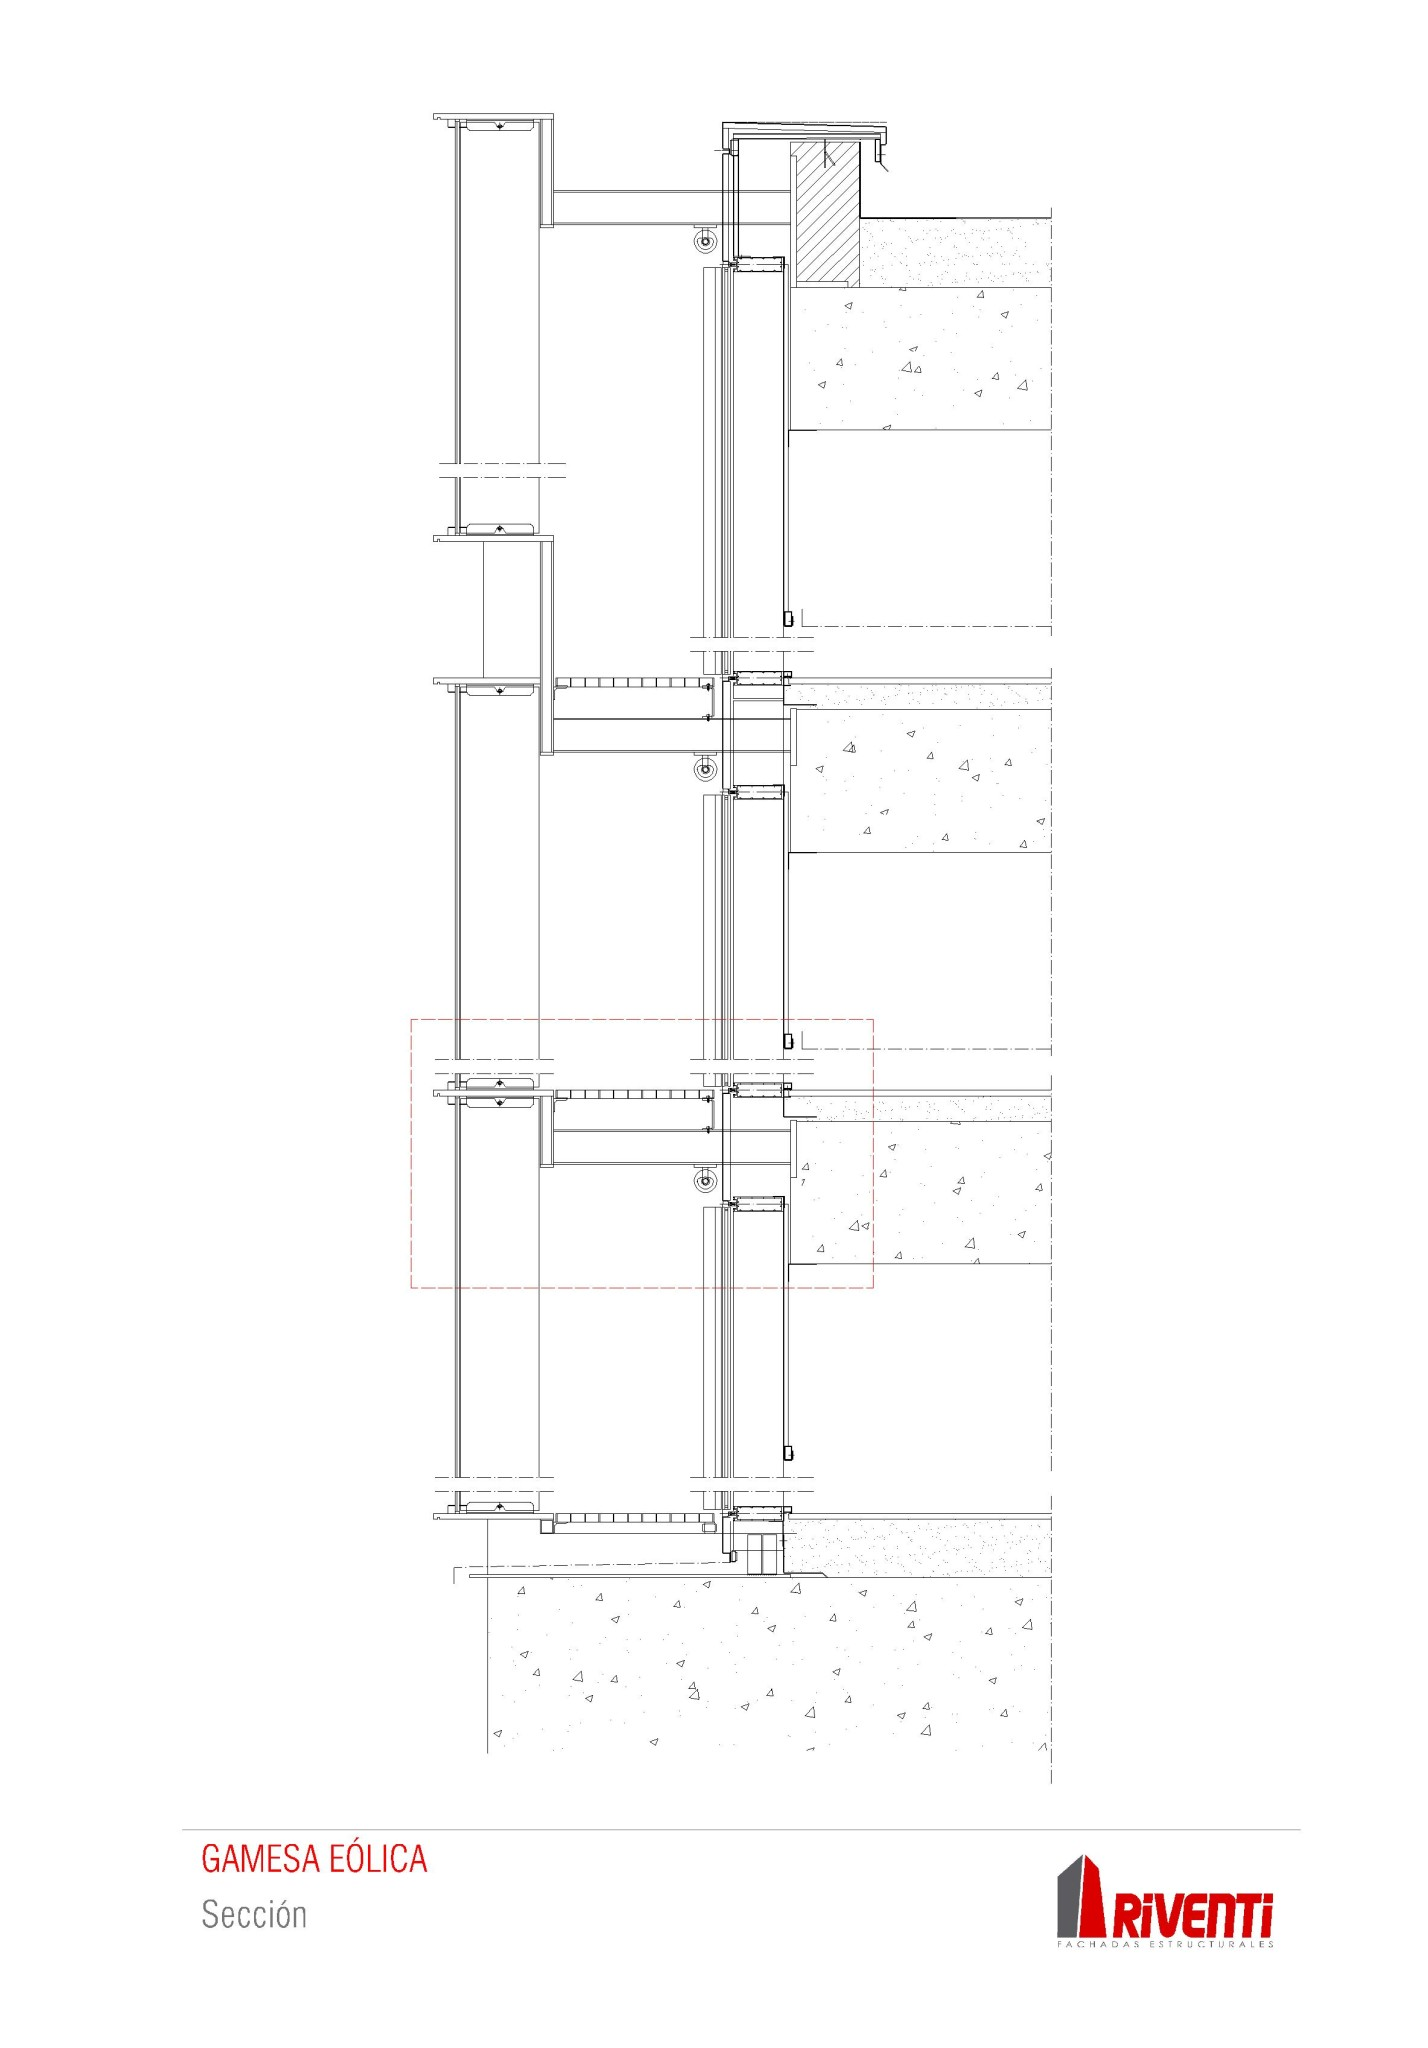 R-57_GAMESA EÓLICA-Sección